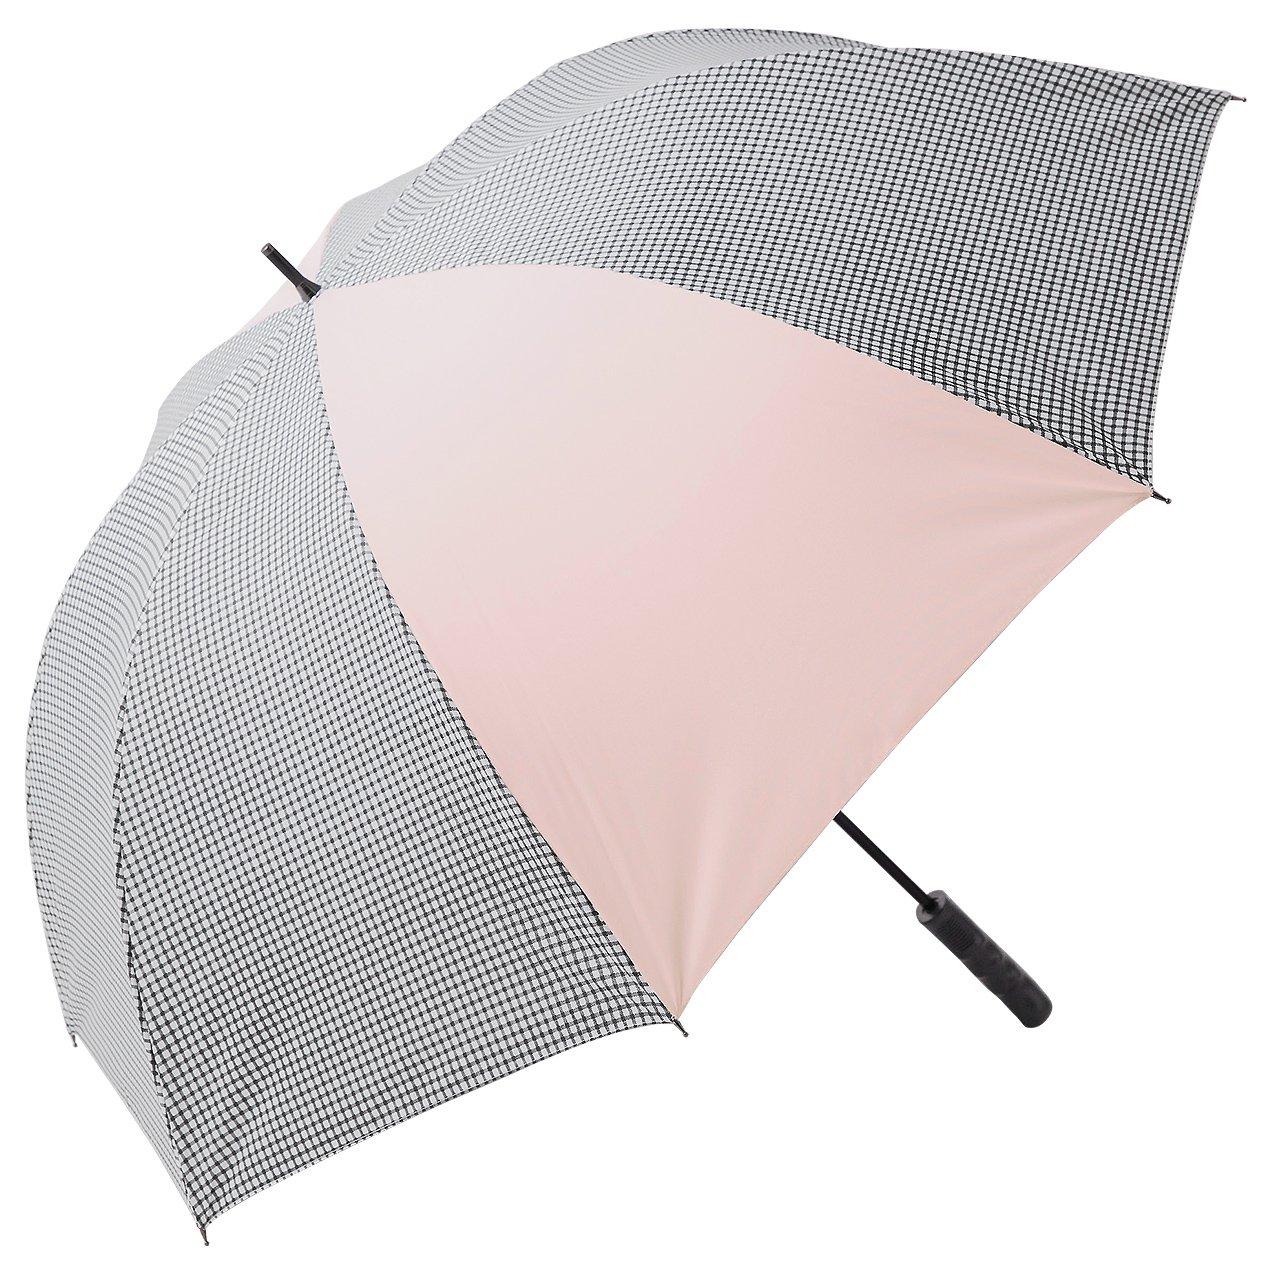 【Rose Blanc】100%完全遮光 日傘 晴雨兼用 ゴルフ プレーン&パイピング 75cm (ギンガムC×ピンク(プレーン)) B06XTH54K4 ギンガムC×ピンク(プレーン) ギンガムC×ピンク(プレーン)